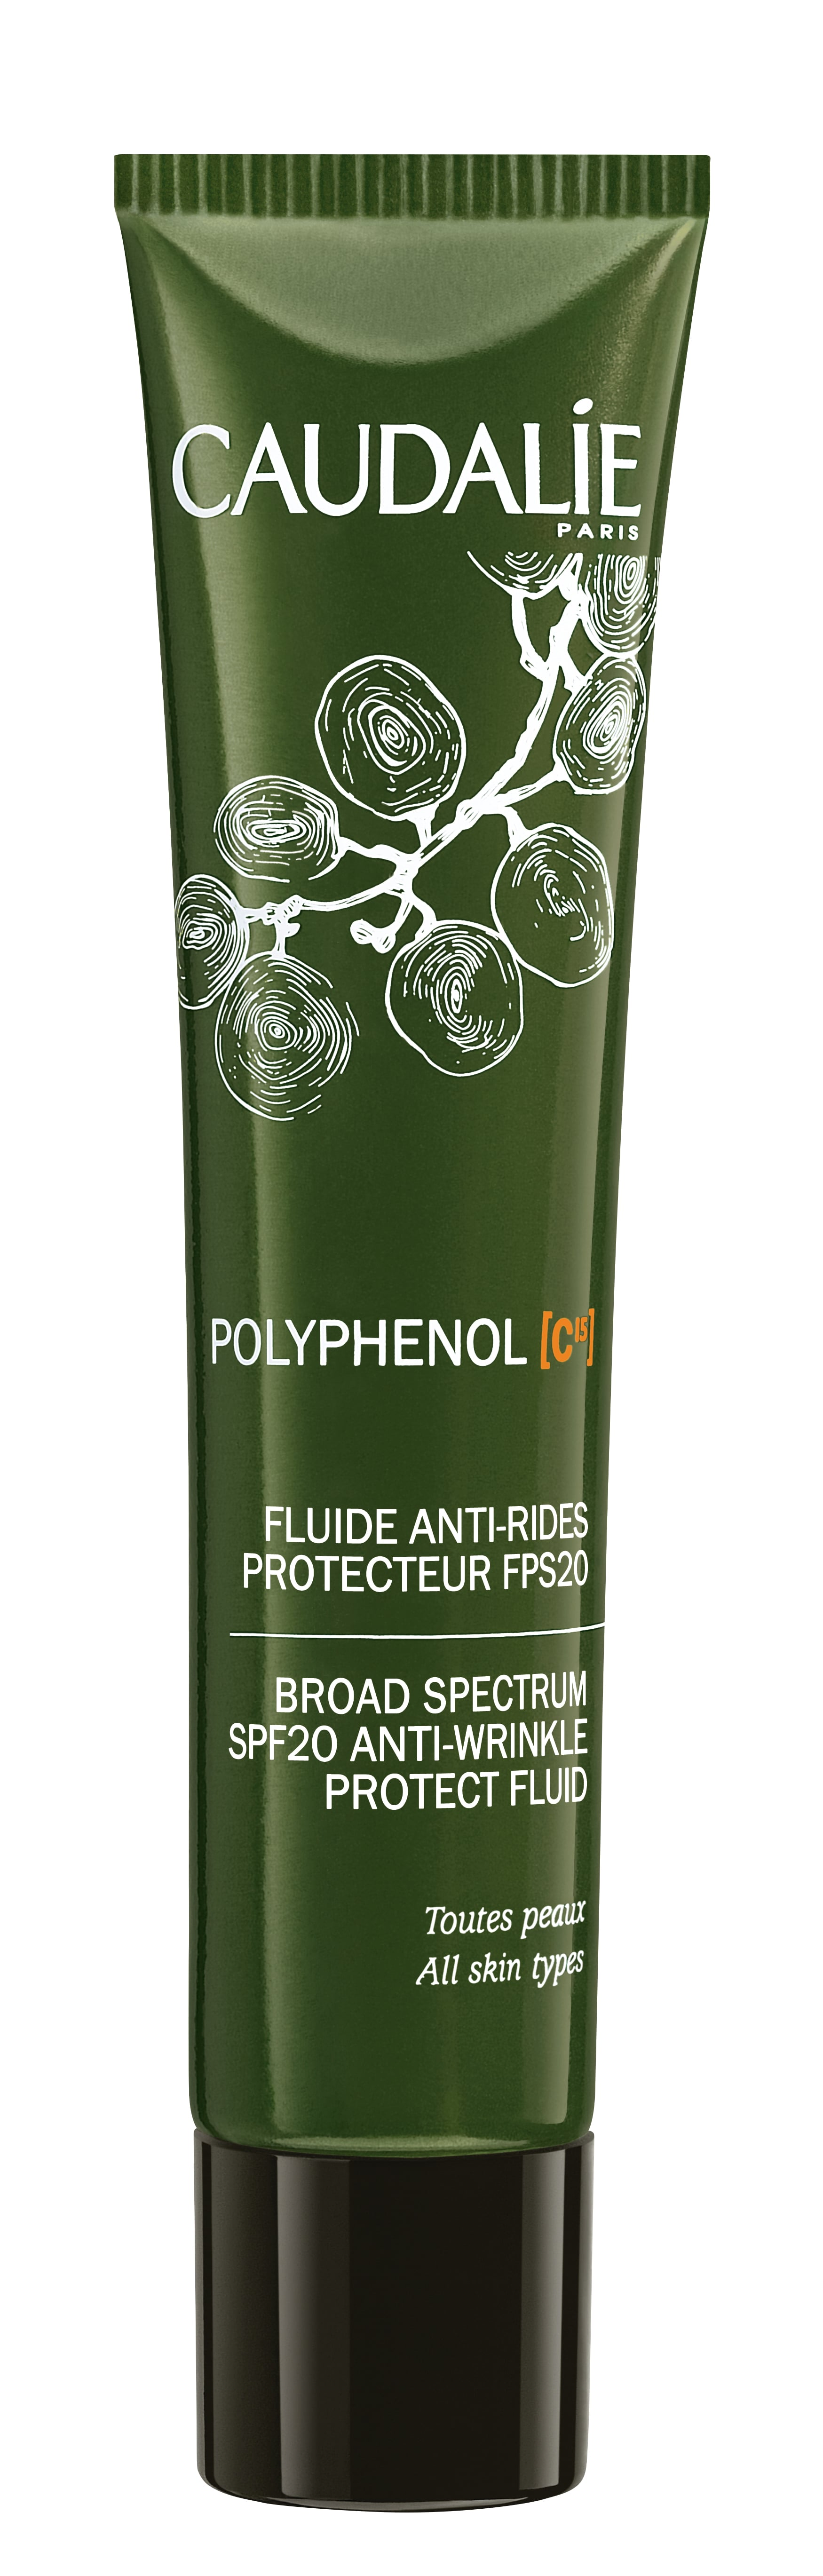 Caudalie C15 Polyphenol  Protect Fluid SPF 20